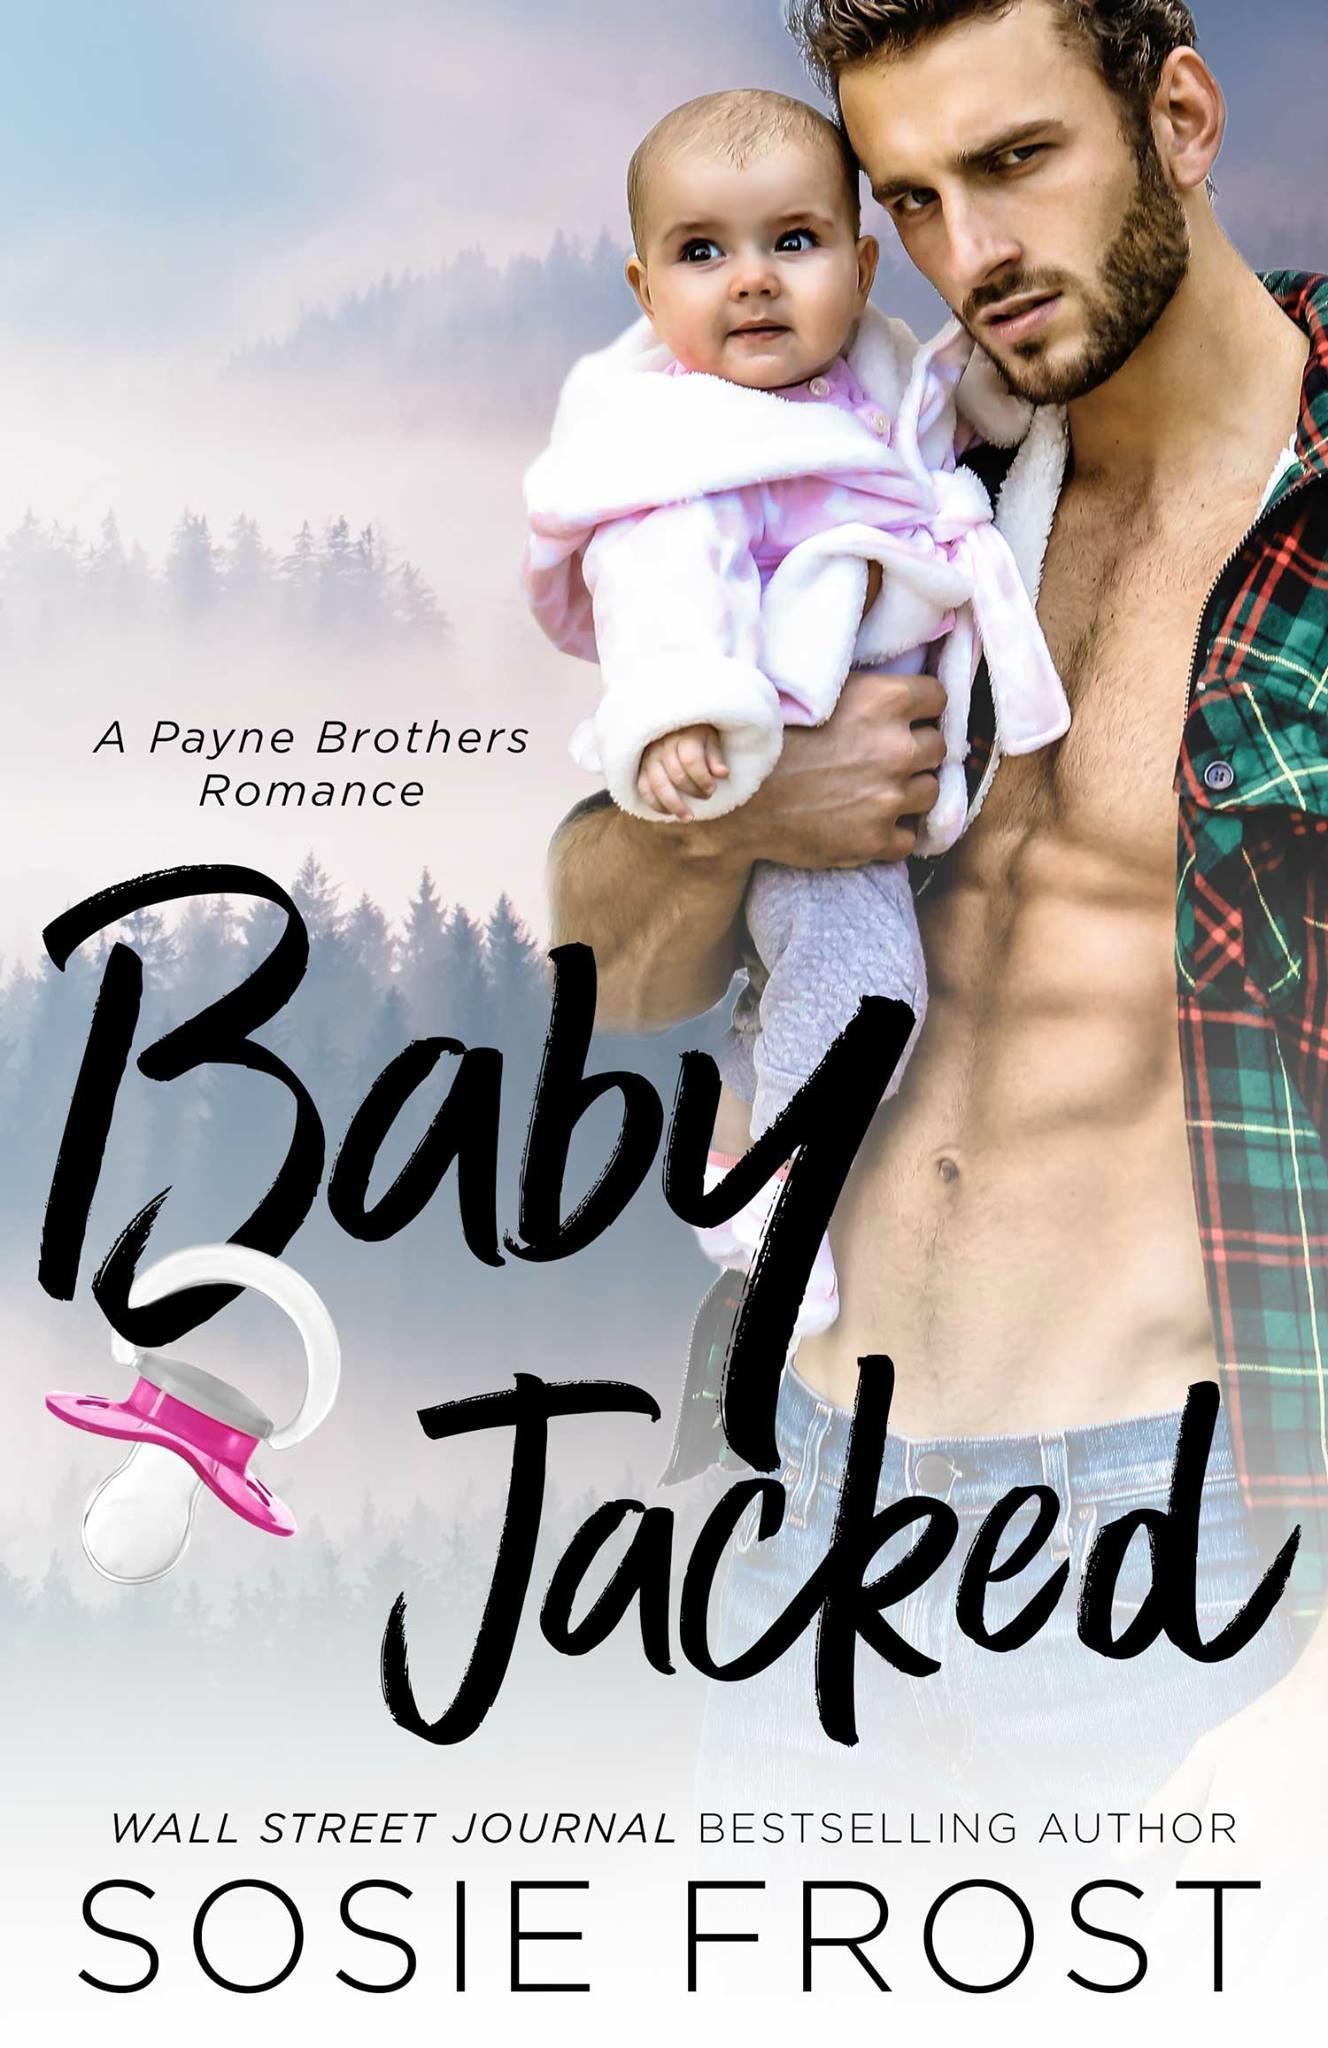 BABY JACKED